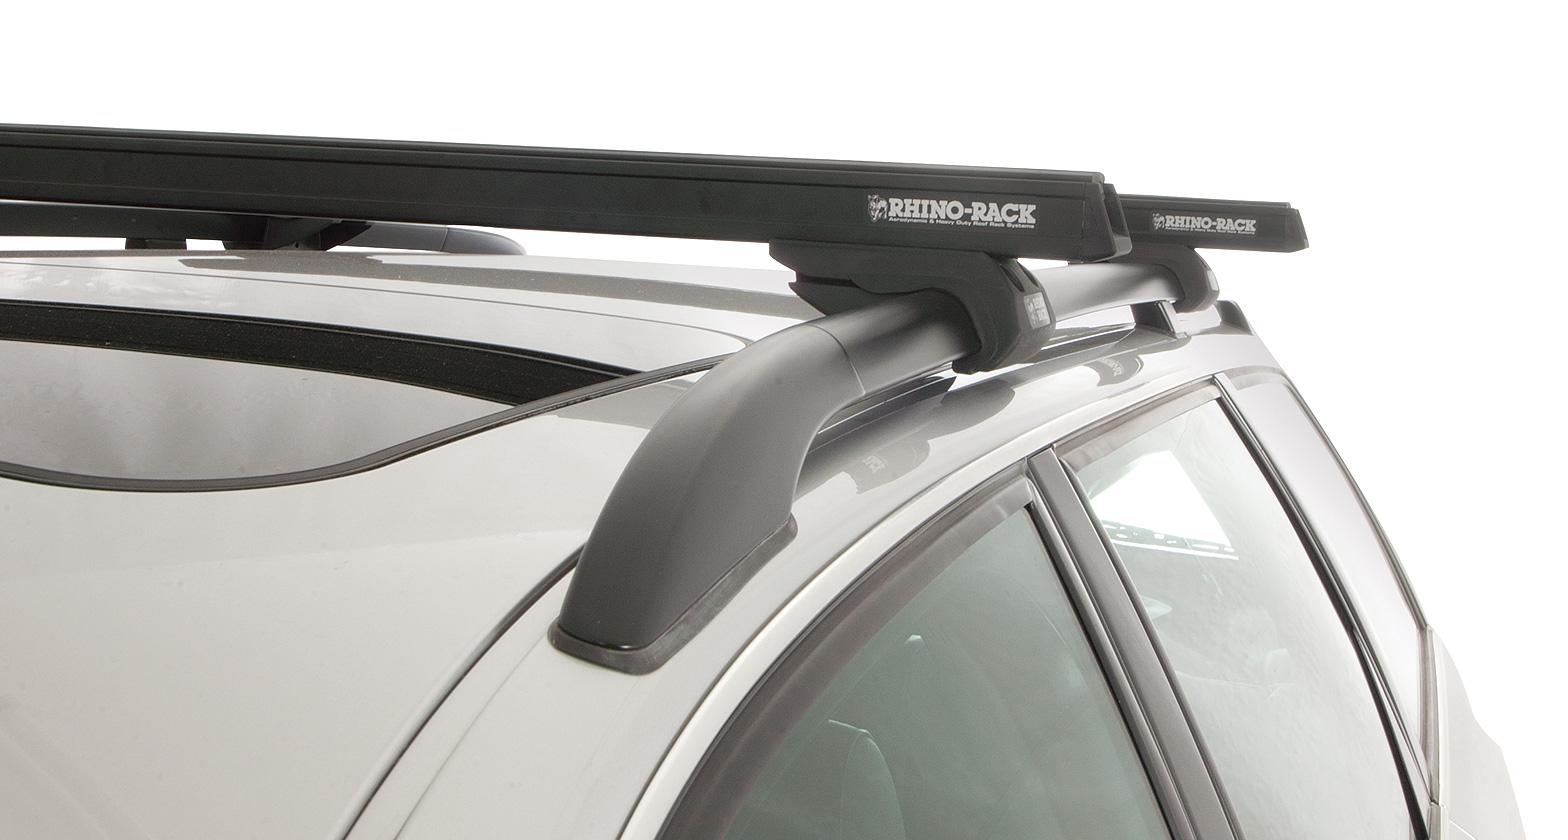 Ja0478 Heavy Duty Cxb Black 2 Bar Roof Rack Rhino Rack